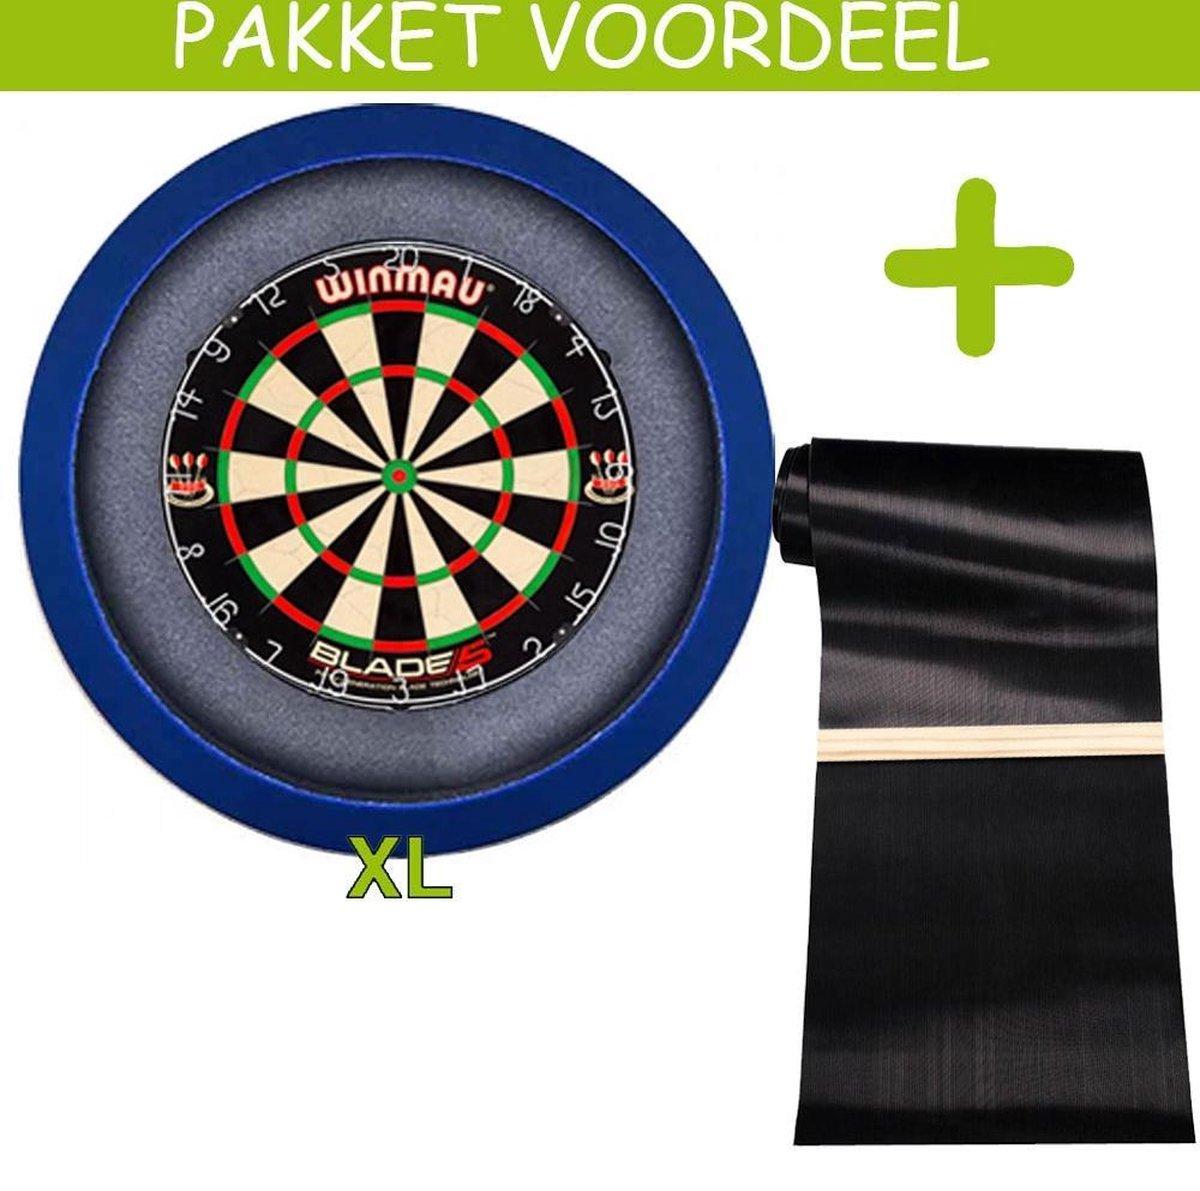 Dartbaan Pro - Blade 5 - 90 x 300 Inclusief Oche - Dartbordverlichting Basic XL - (Blauw)